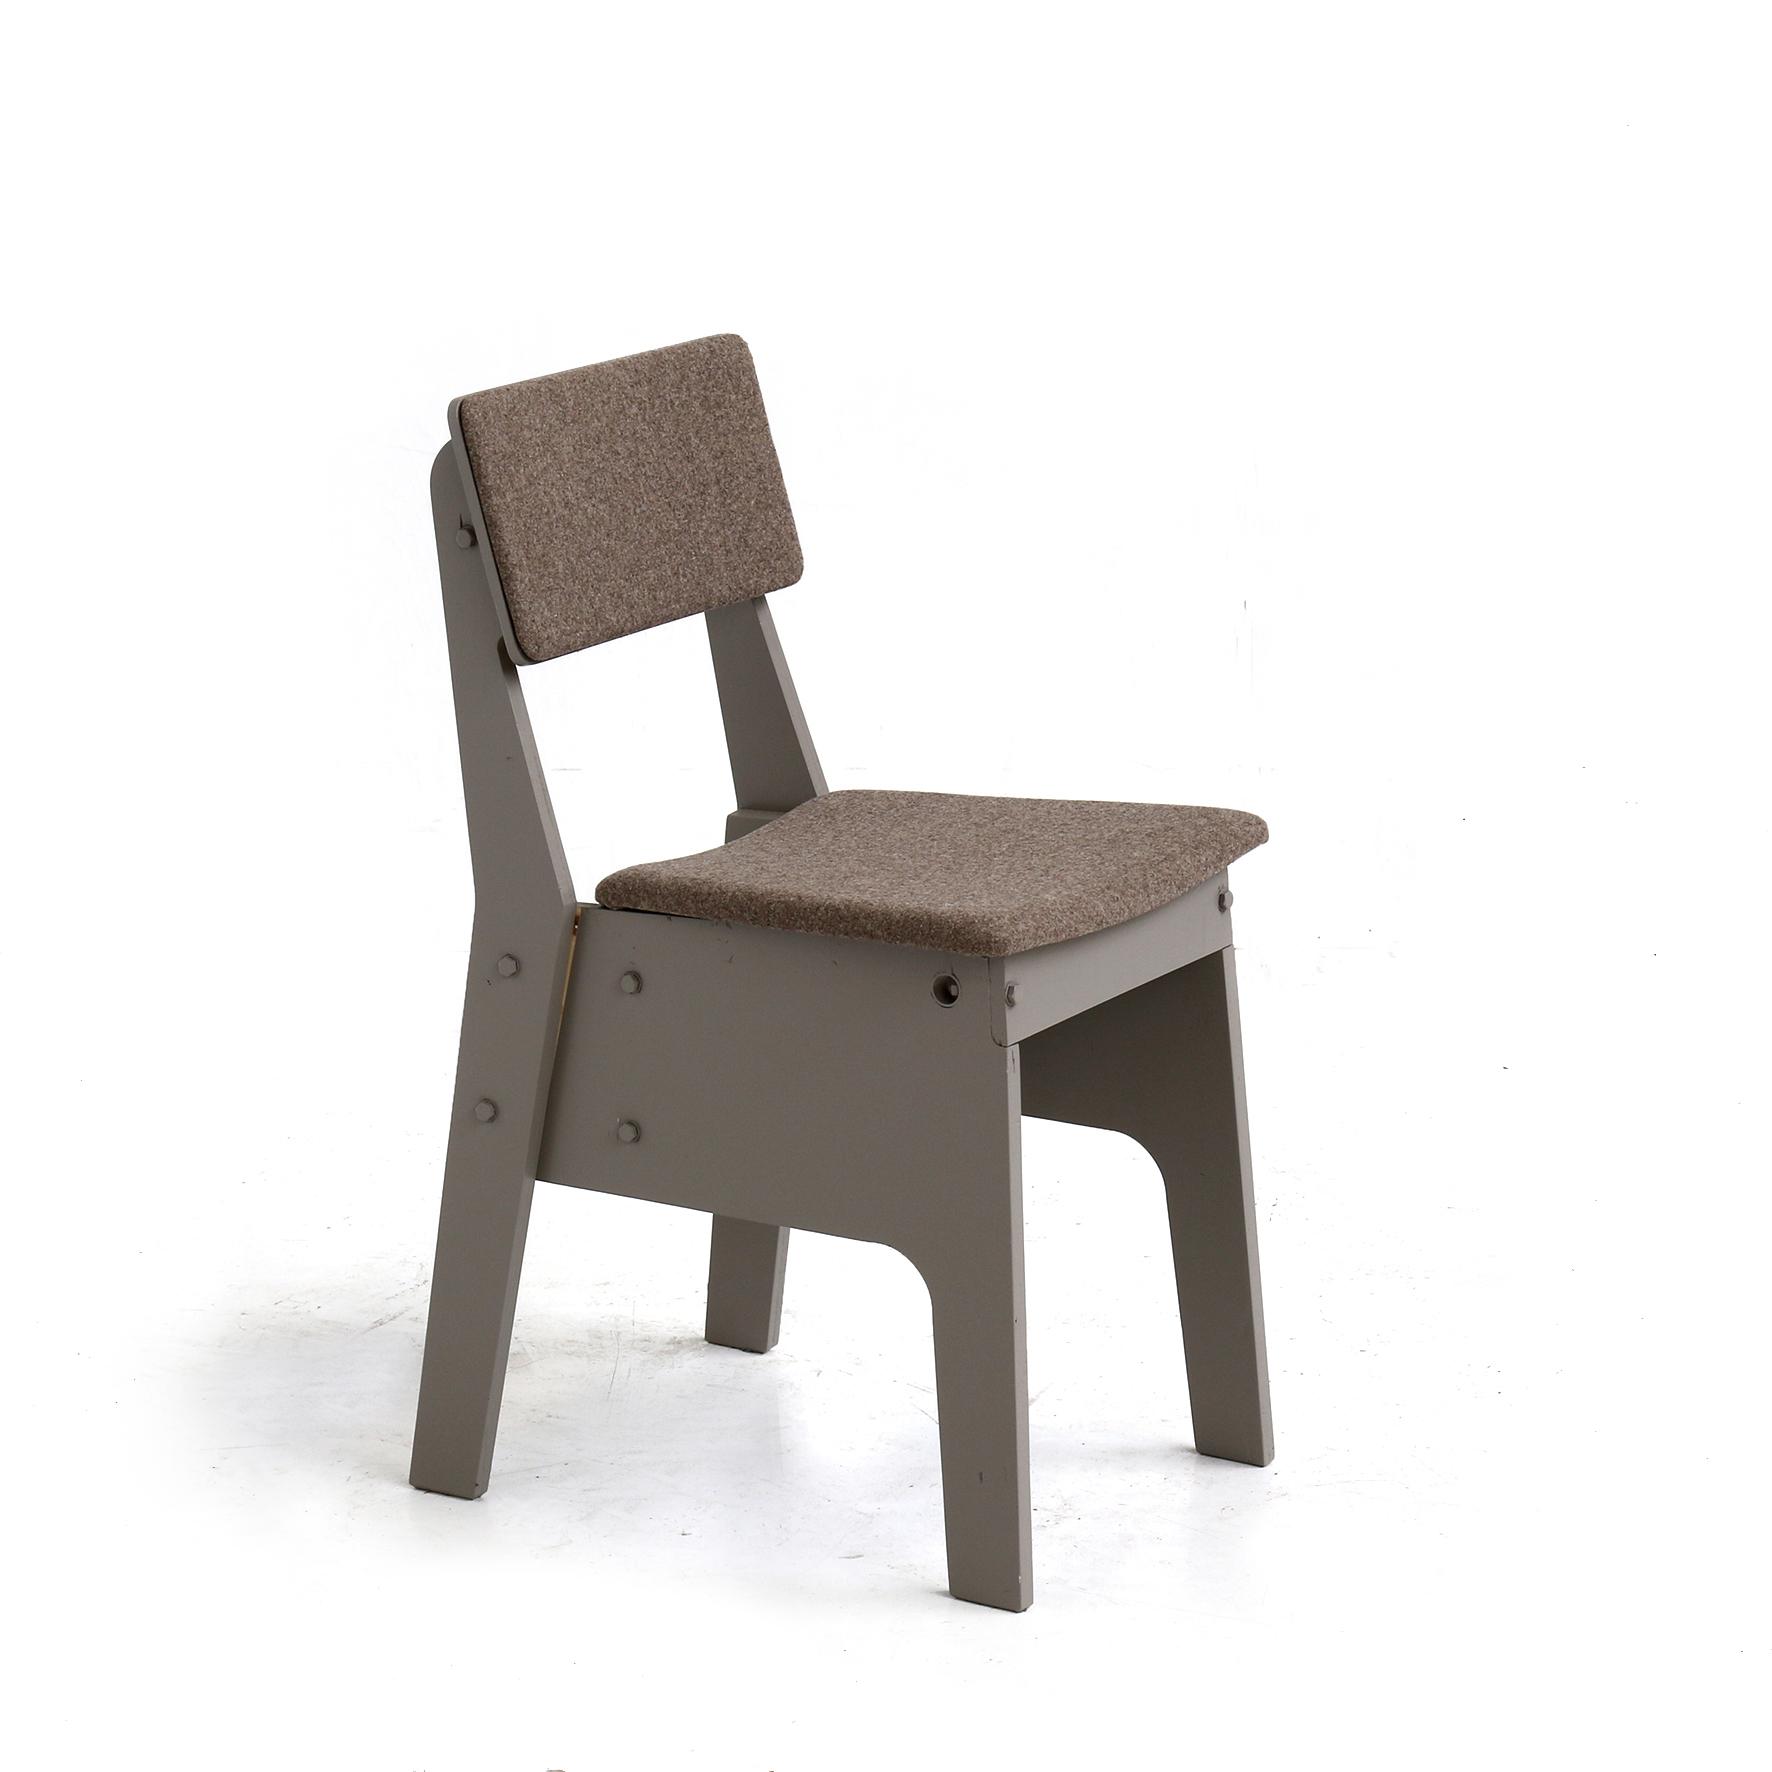 Chairs   Product categories   PIET HEIN EEK